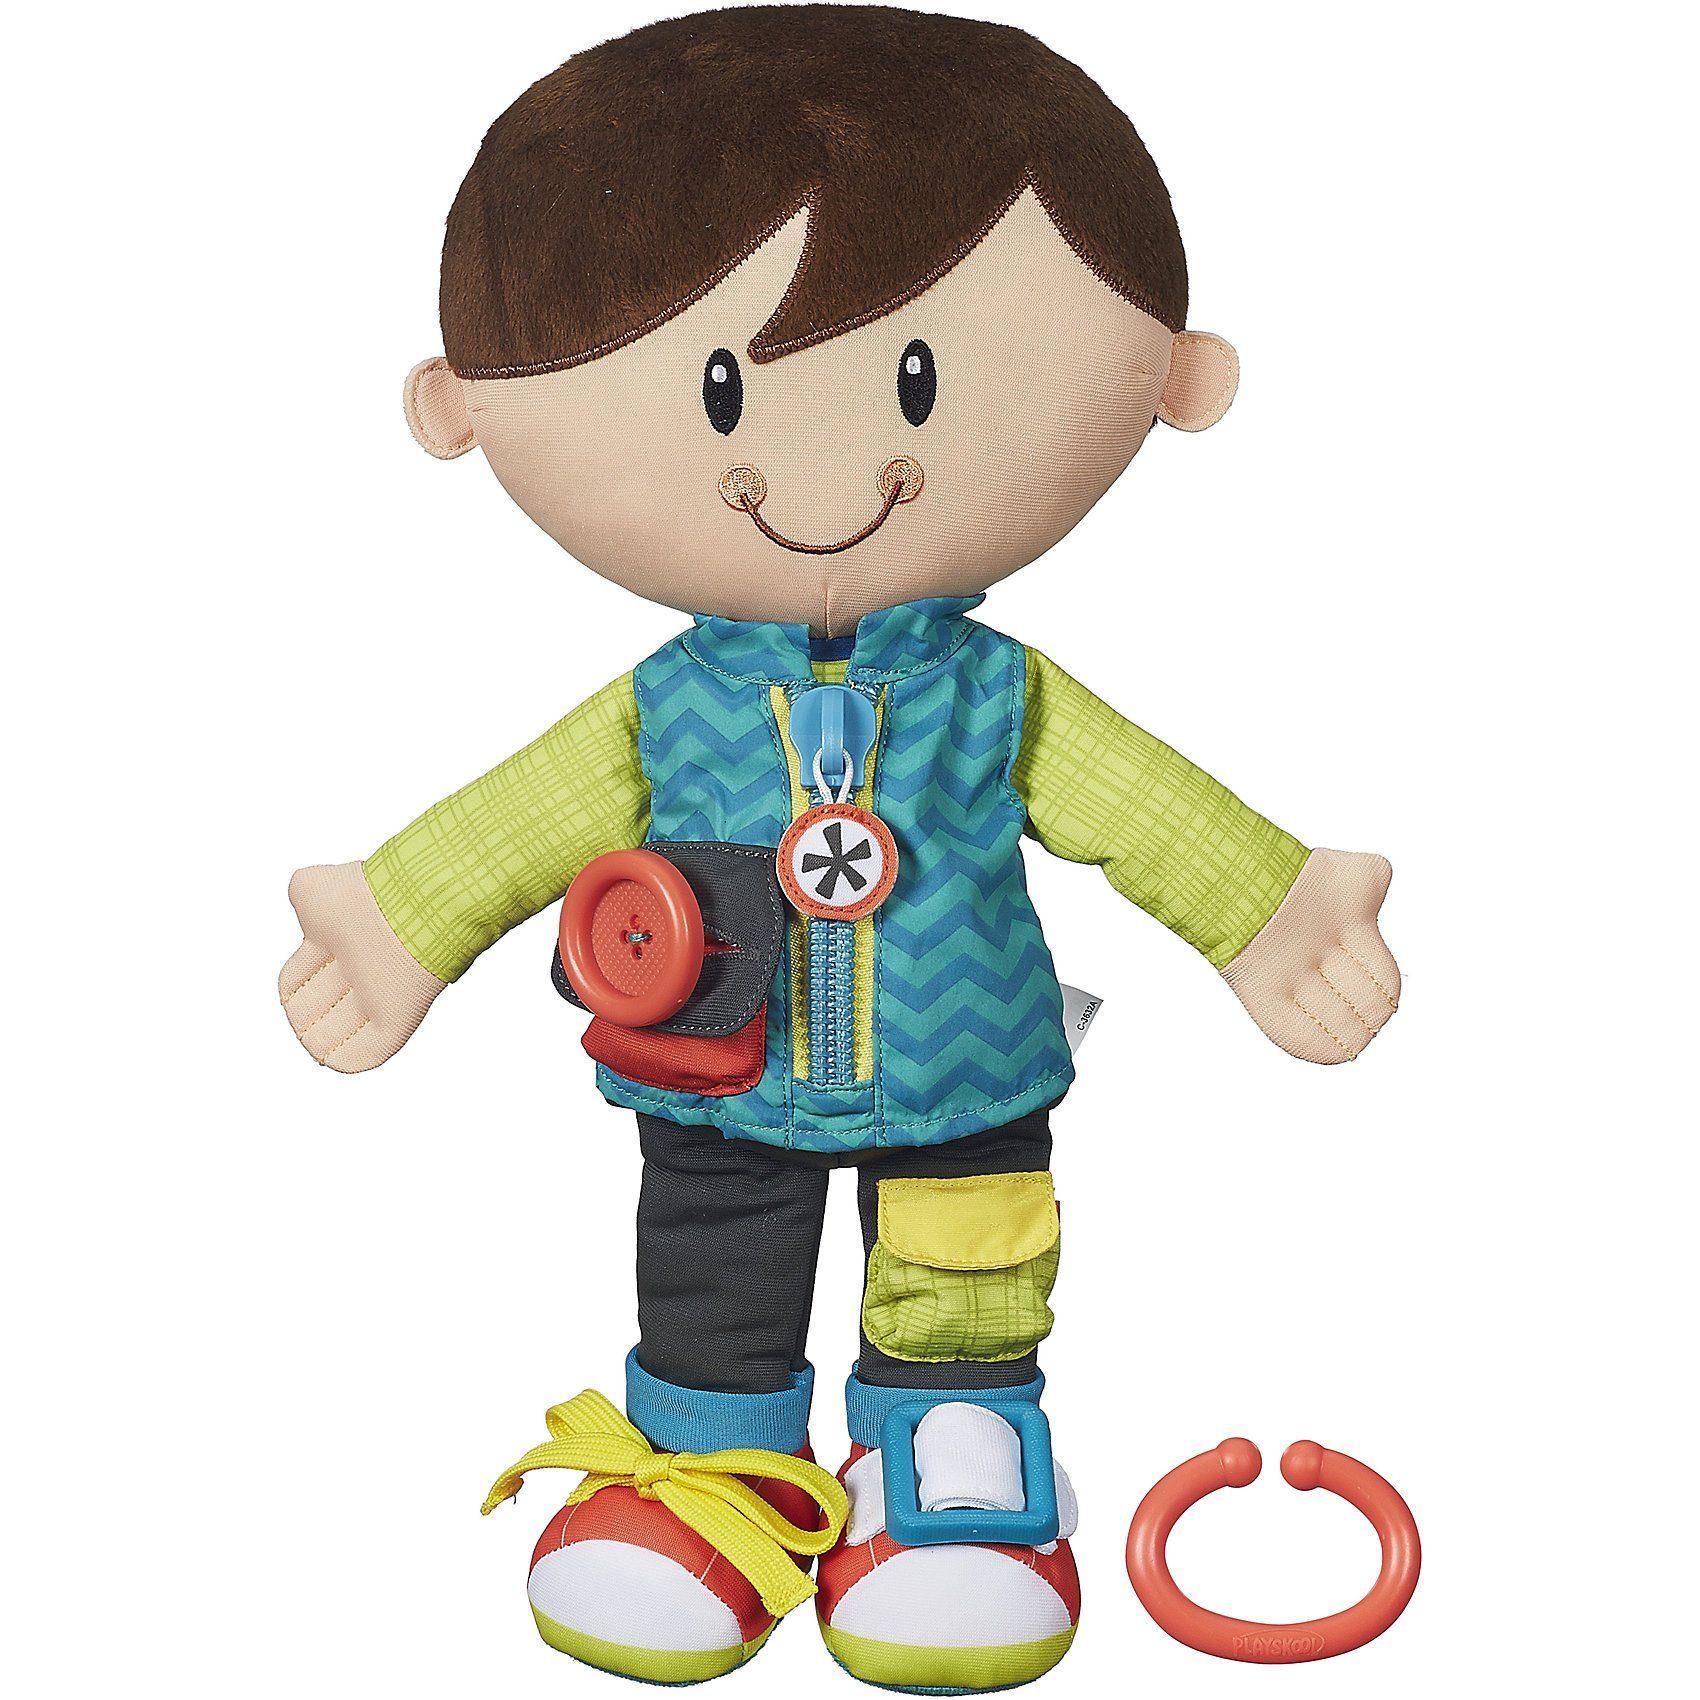 Hasbro Playskool - Anziehspaß-Freunde, Junge